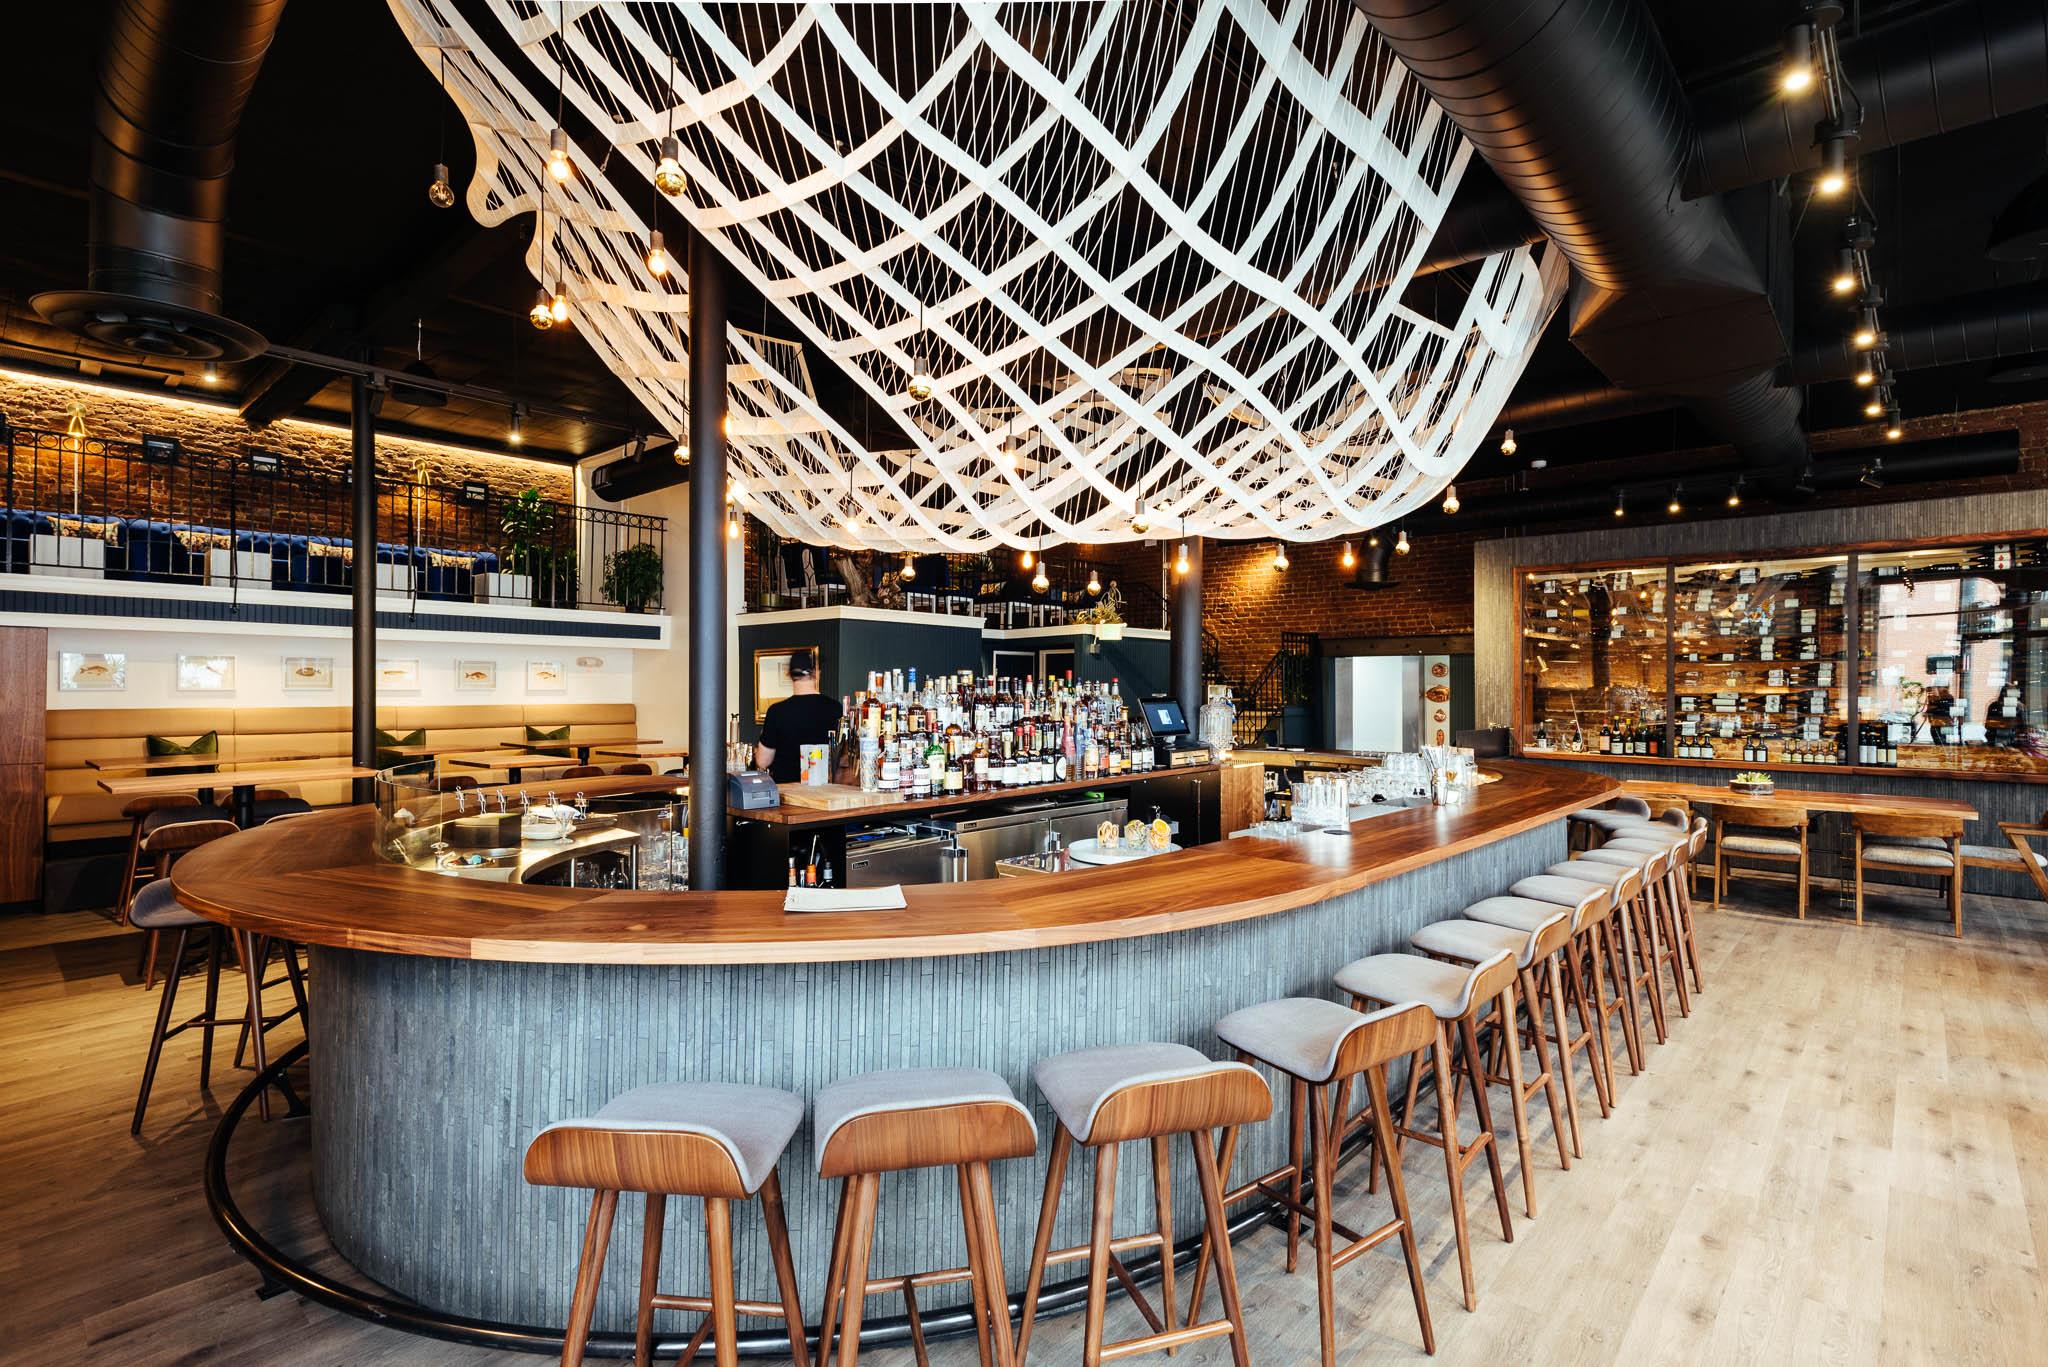 Denver's French Food Scene Steps Forward With Morin